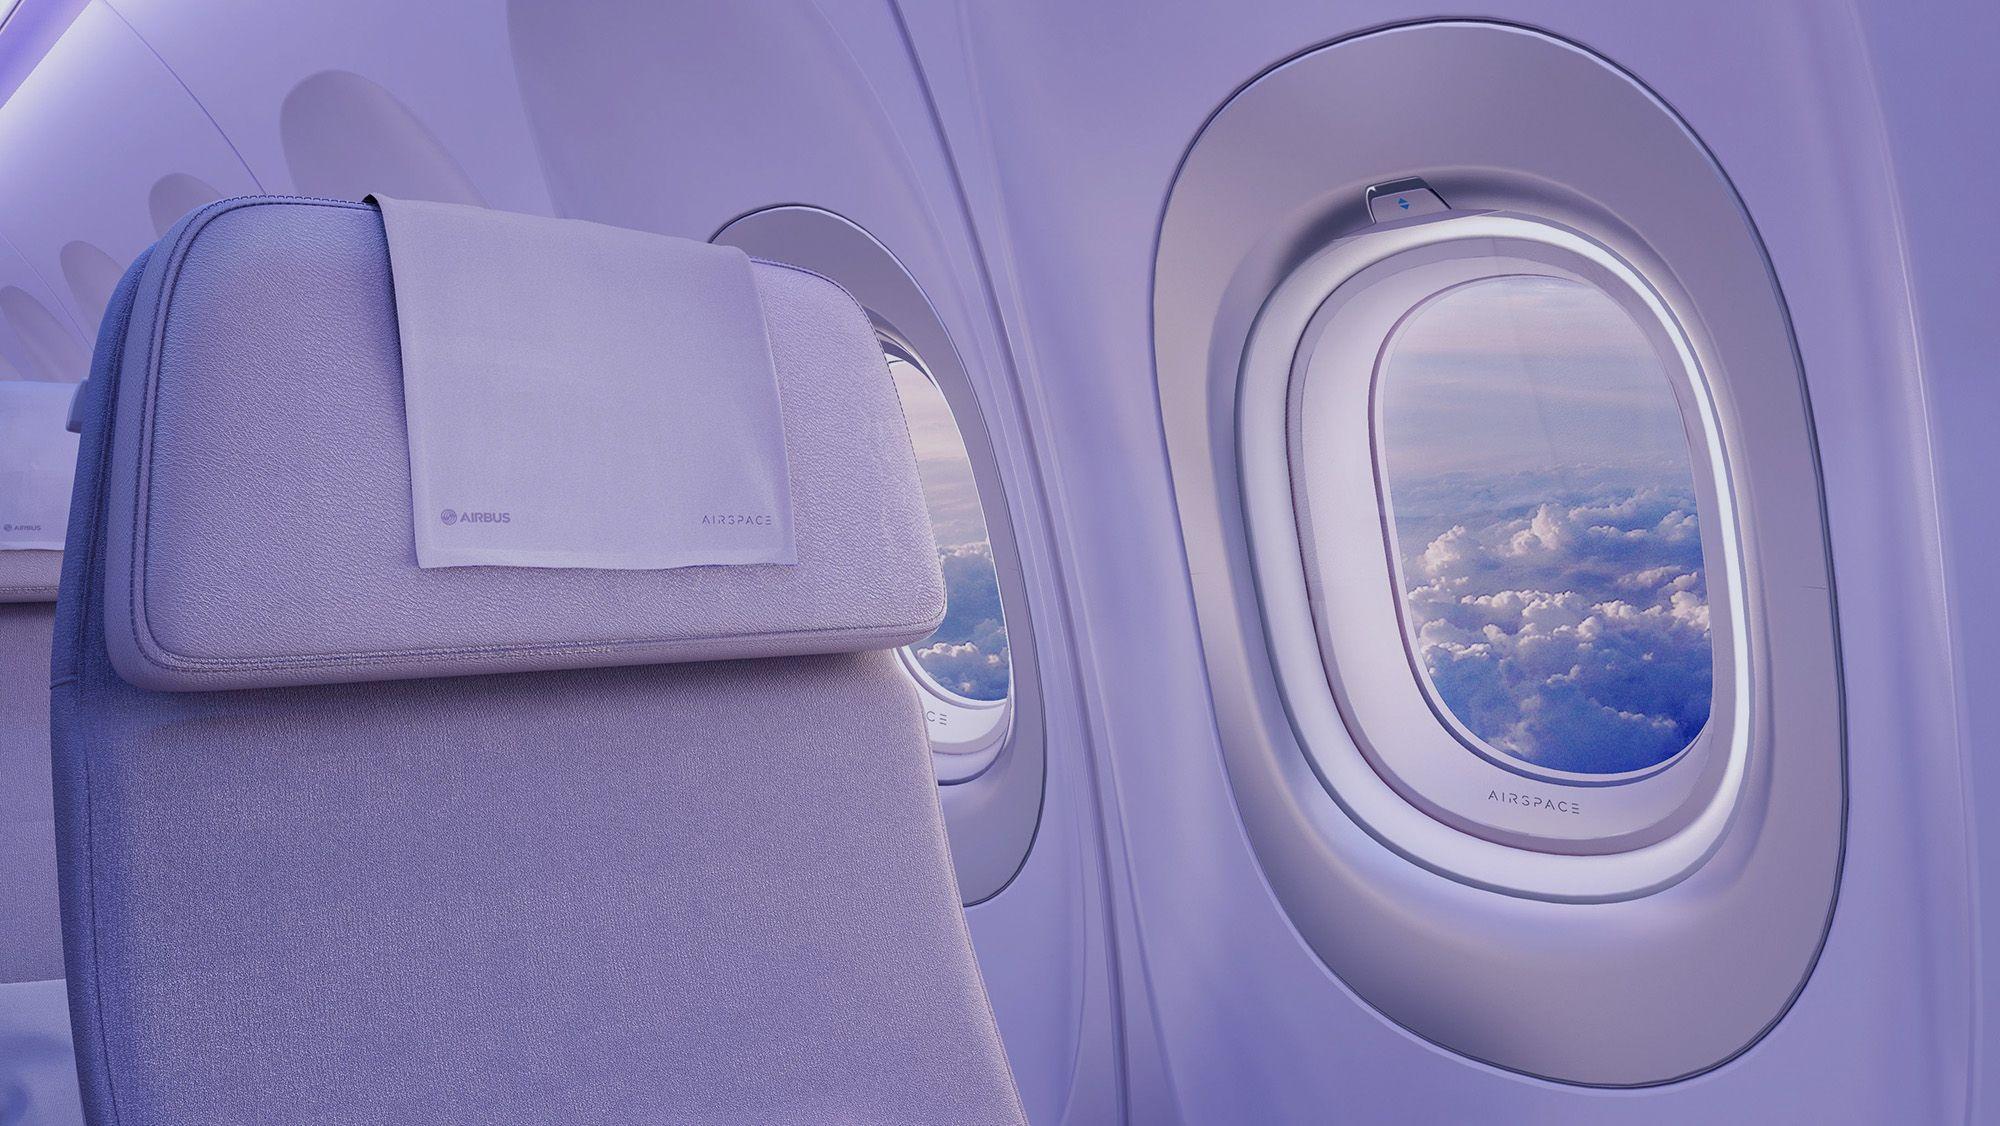 Airspace-cabin-A320neo-window-detail b.jpg